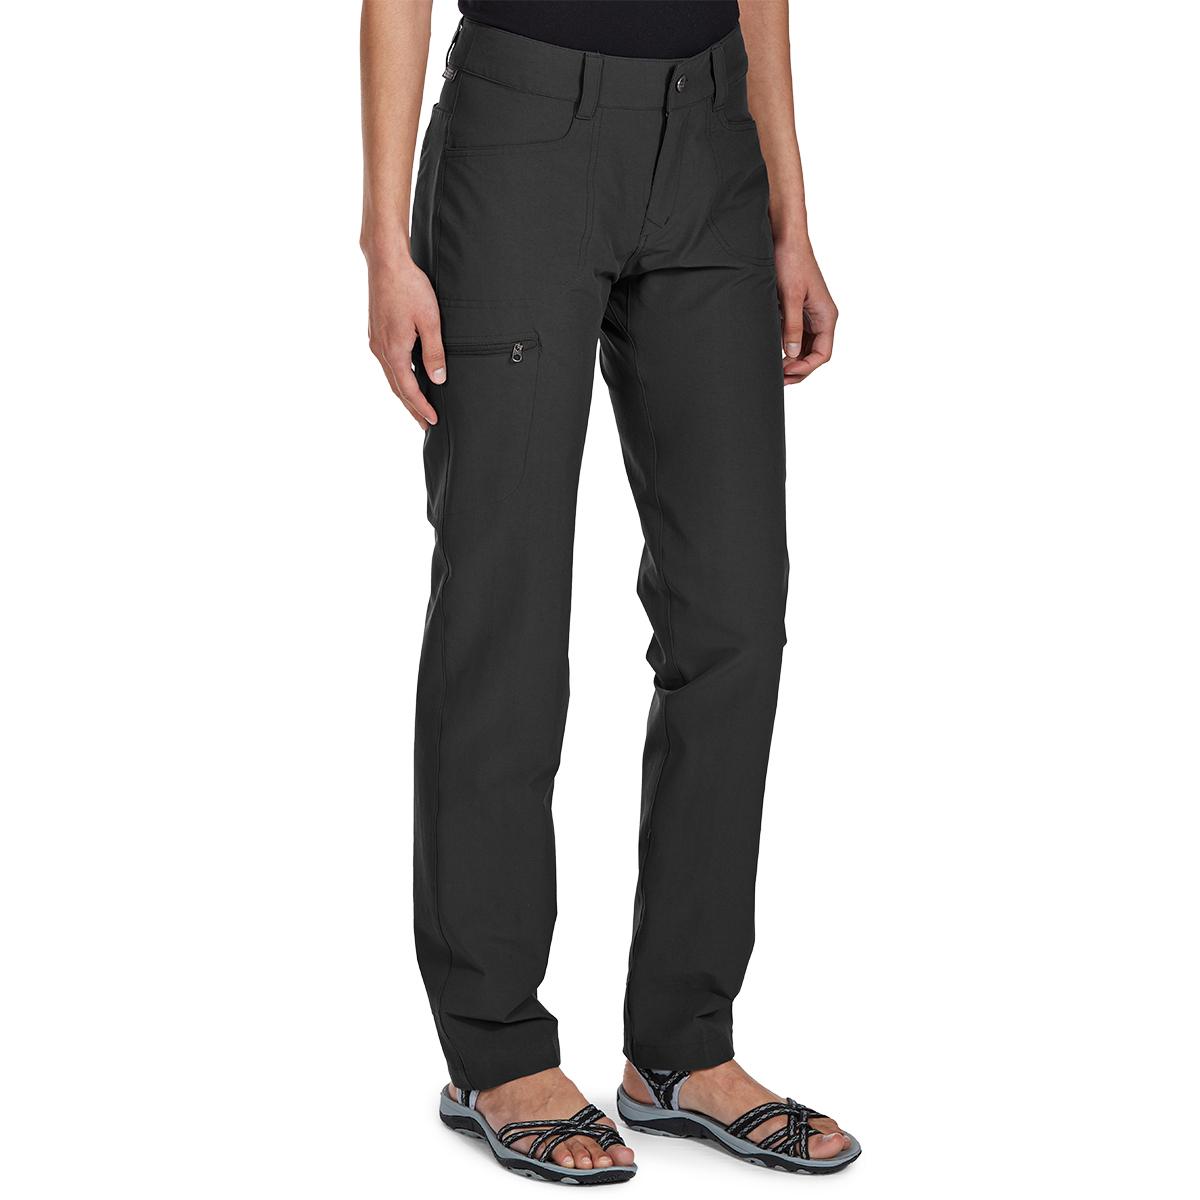 Ems Women's Compass Slim Pants - Black, 0/R